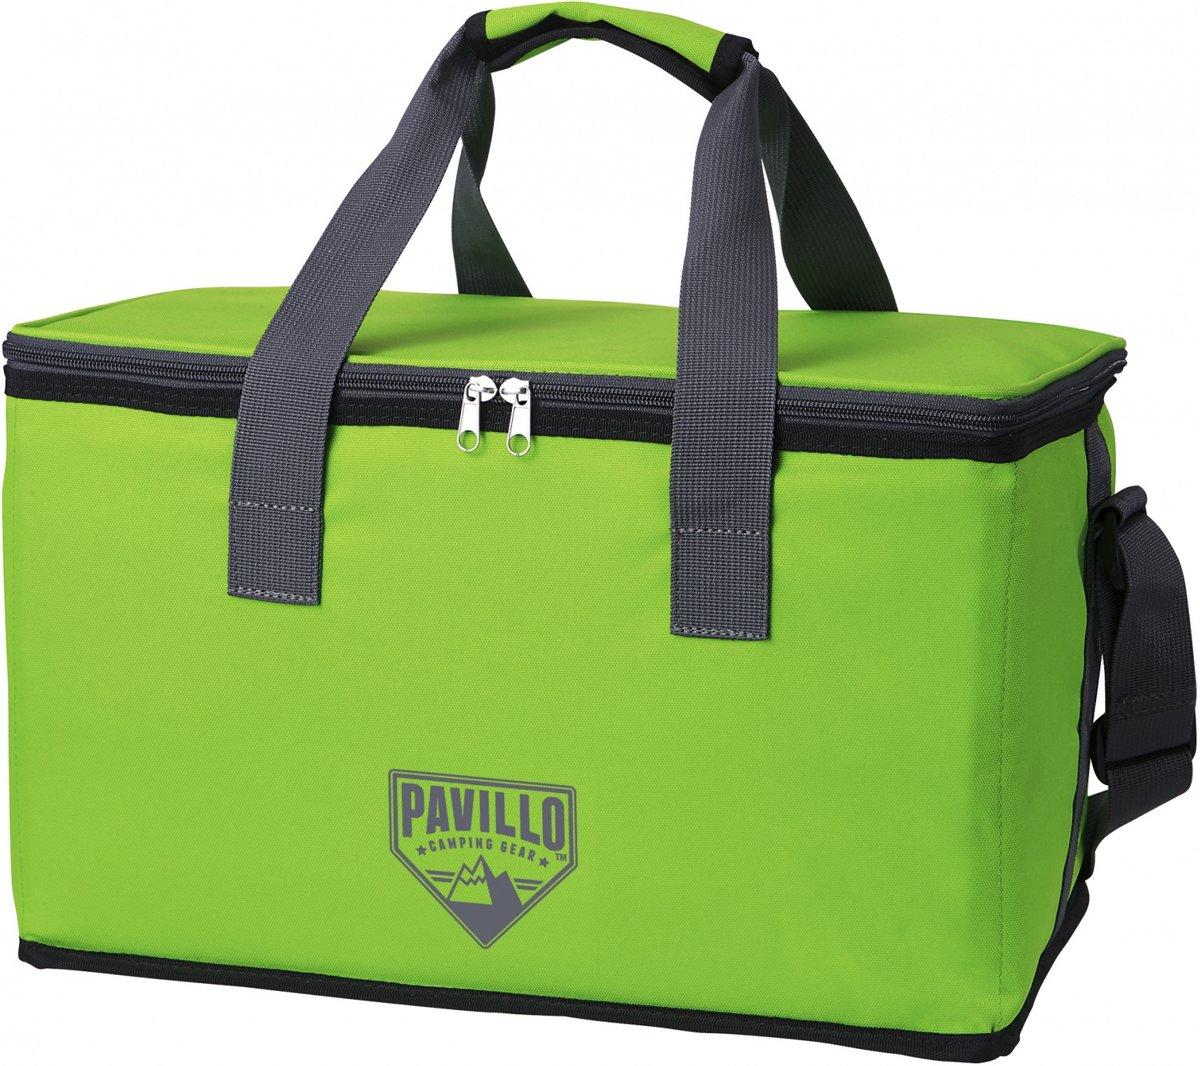 Pavillo Quellor Koeltas 25 Liter Groen kopen